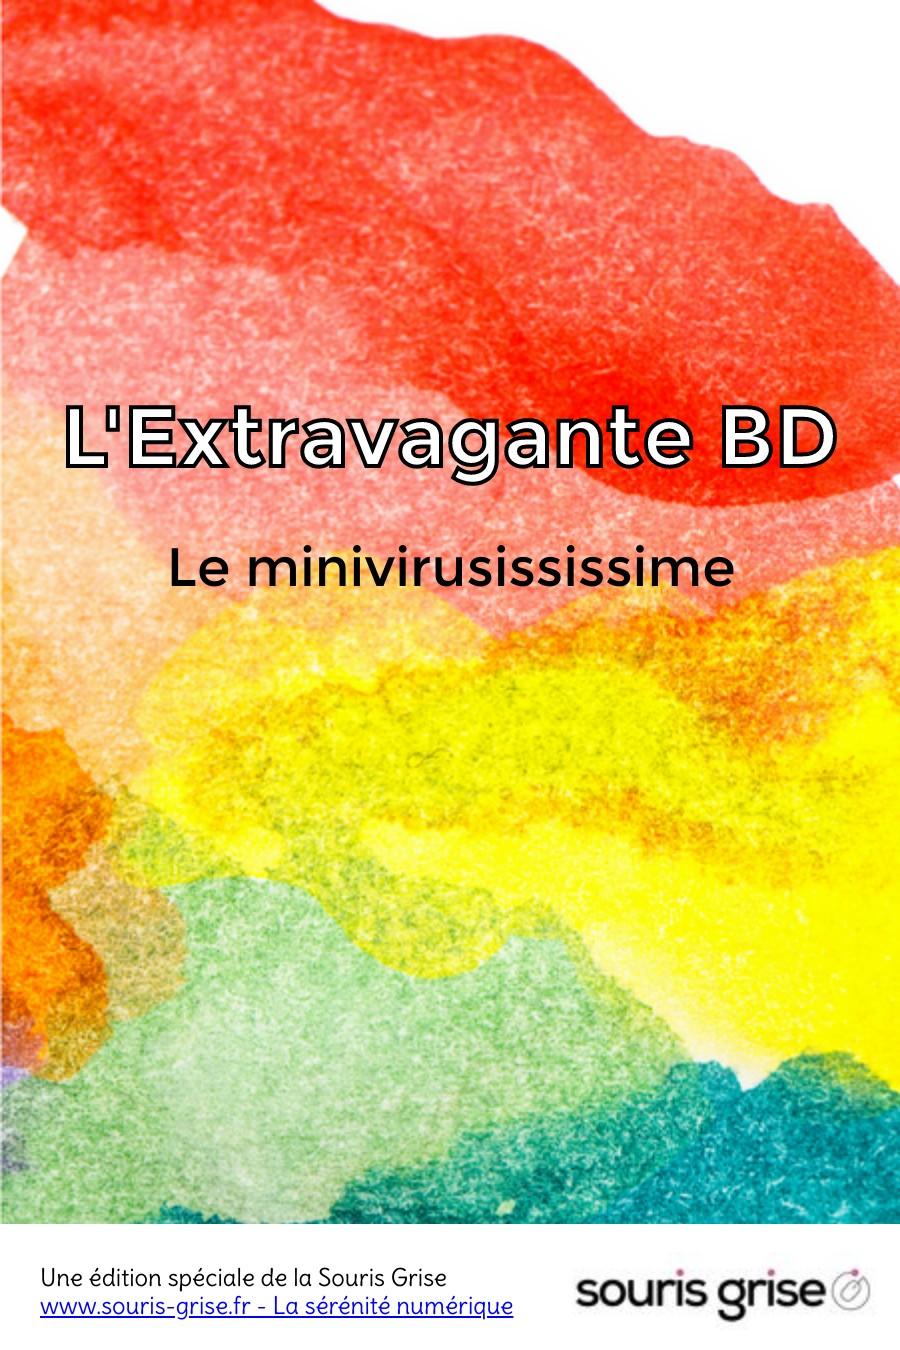 L'Extravagante BD : Le minivirusississime